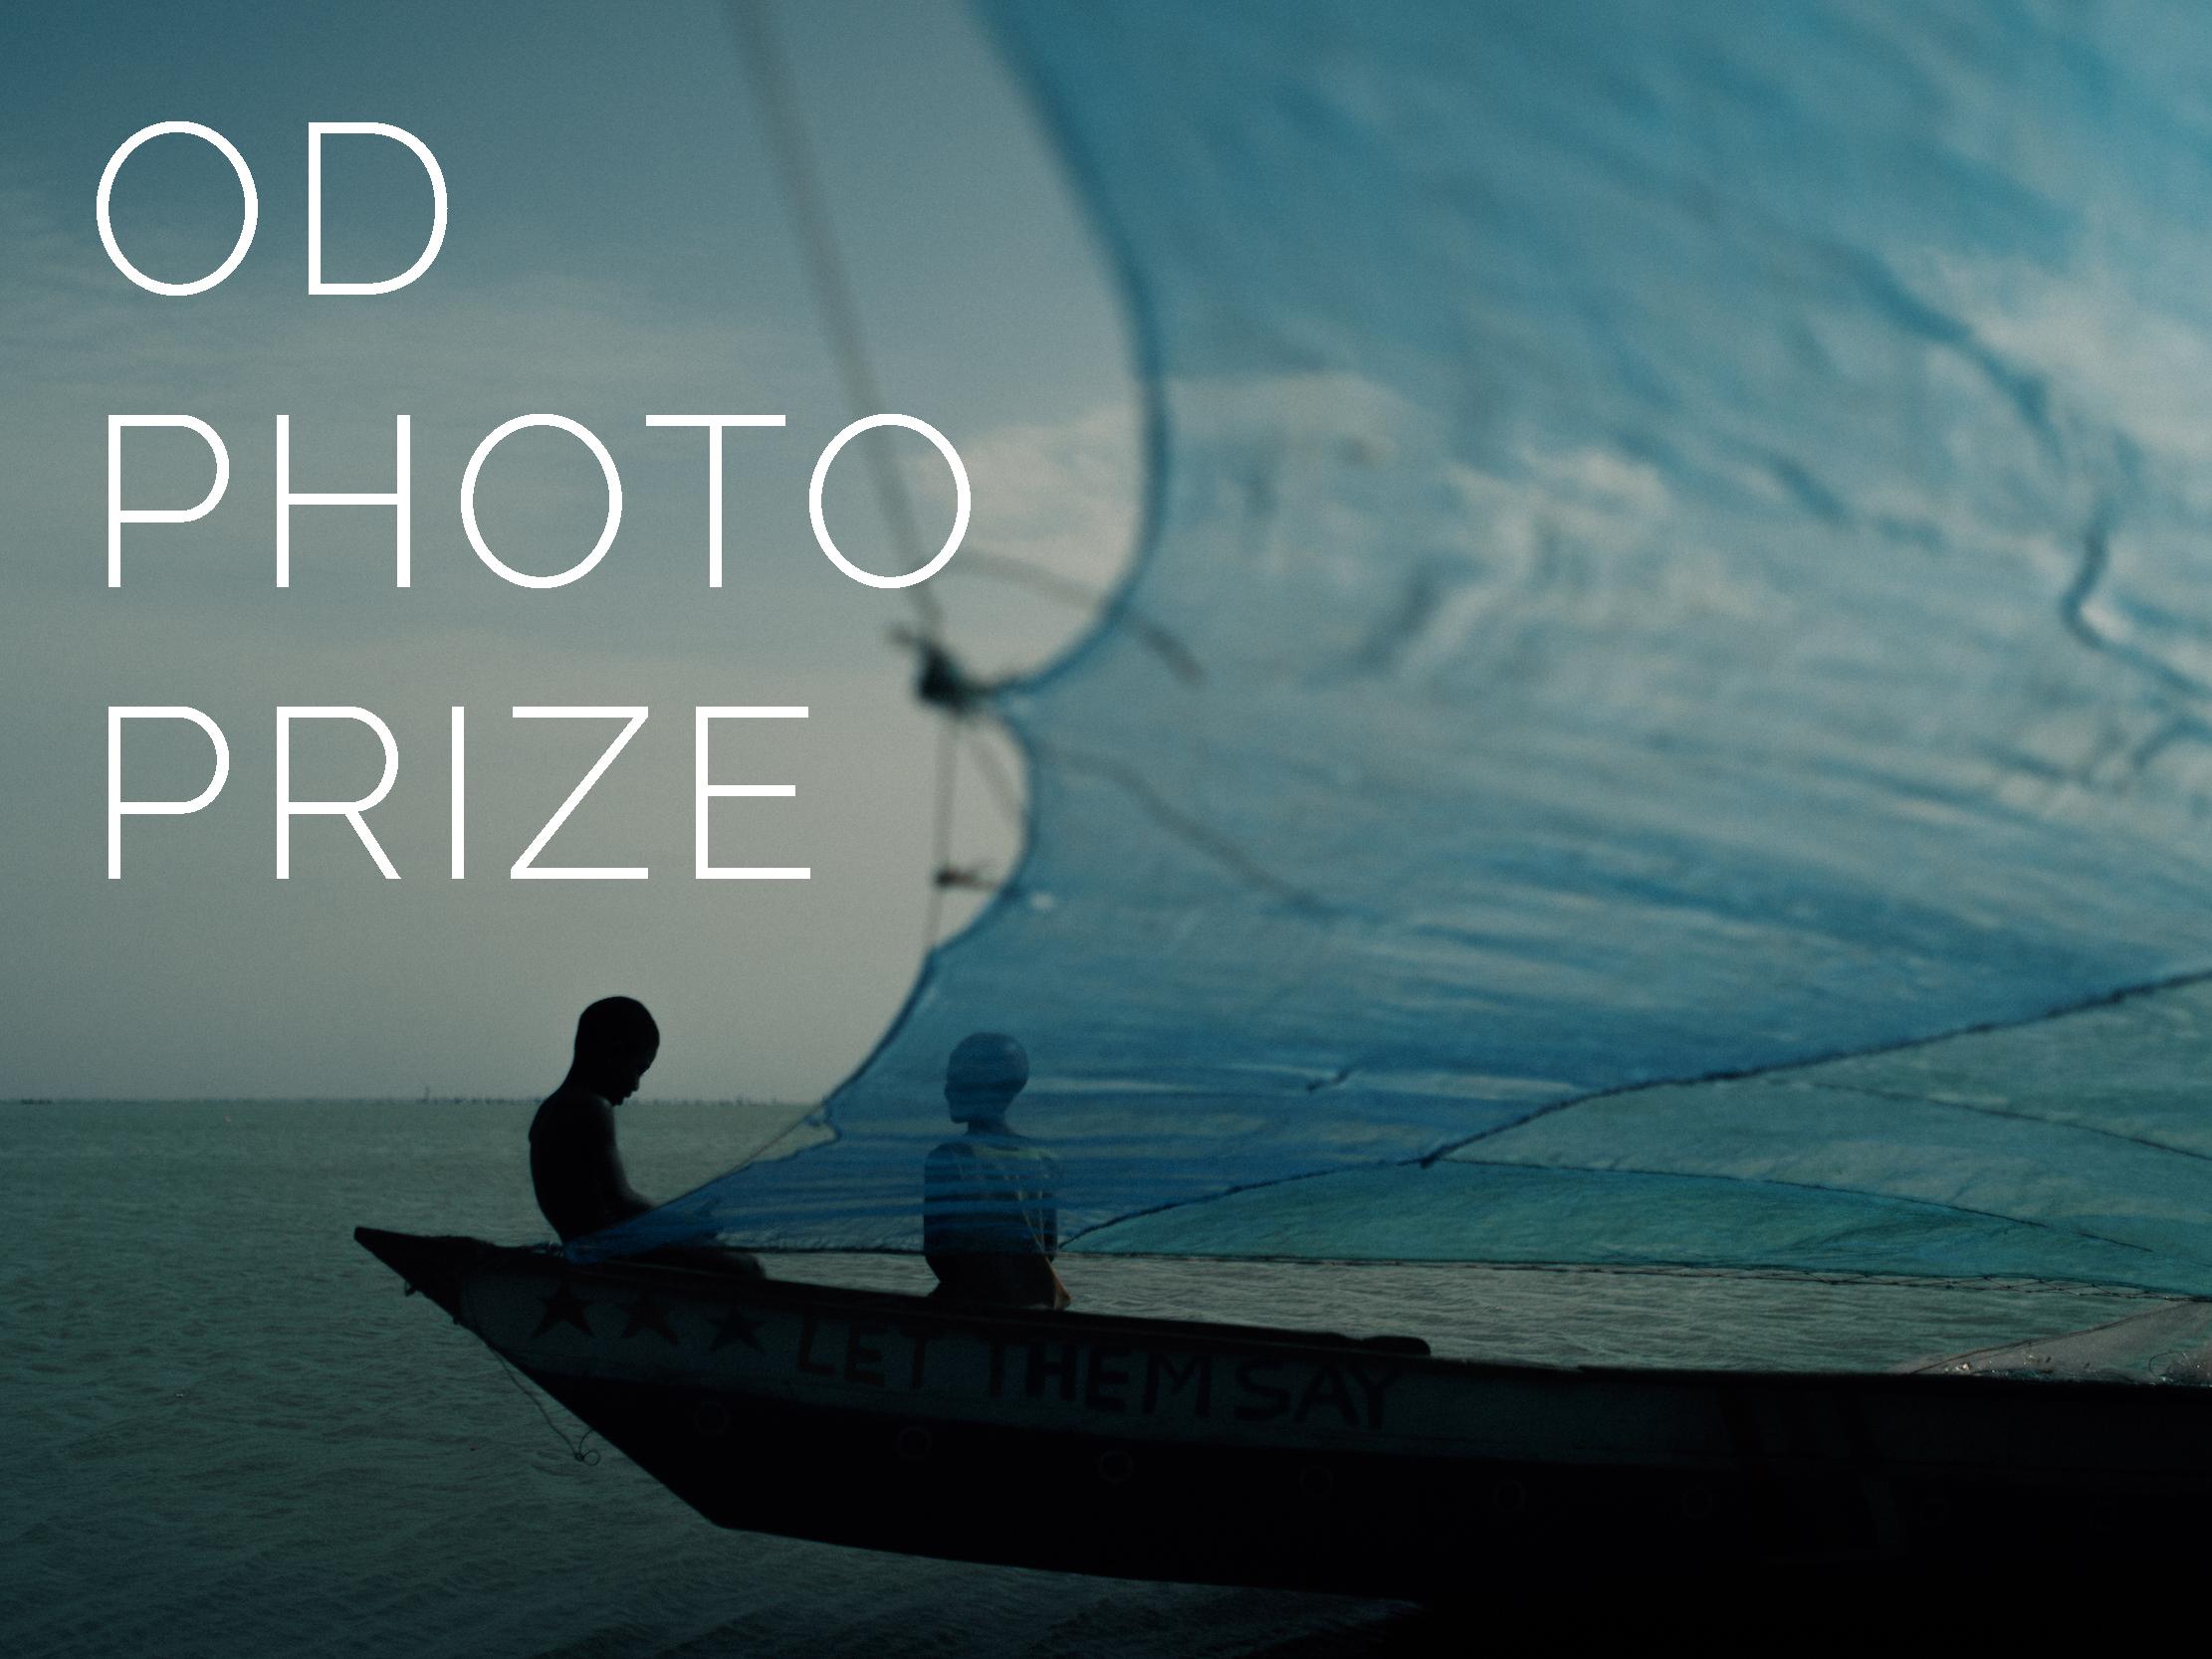 OD Photo Prize